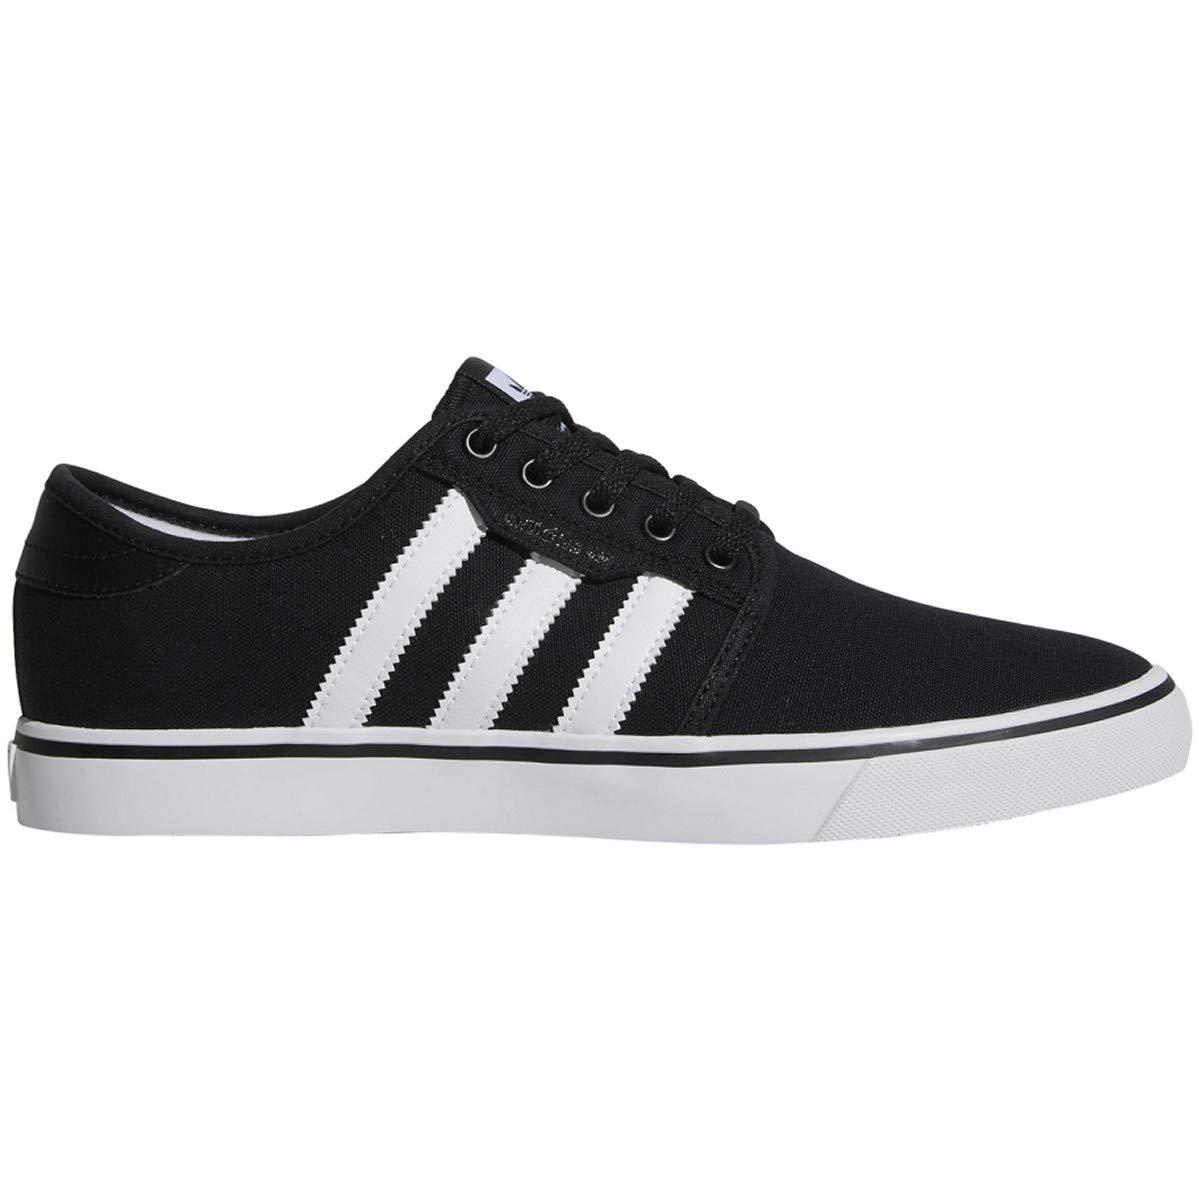 adidas Originals Men's Seeley Running Shoe, Black/White/Gum, 13.5 M US by adidas Originals